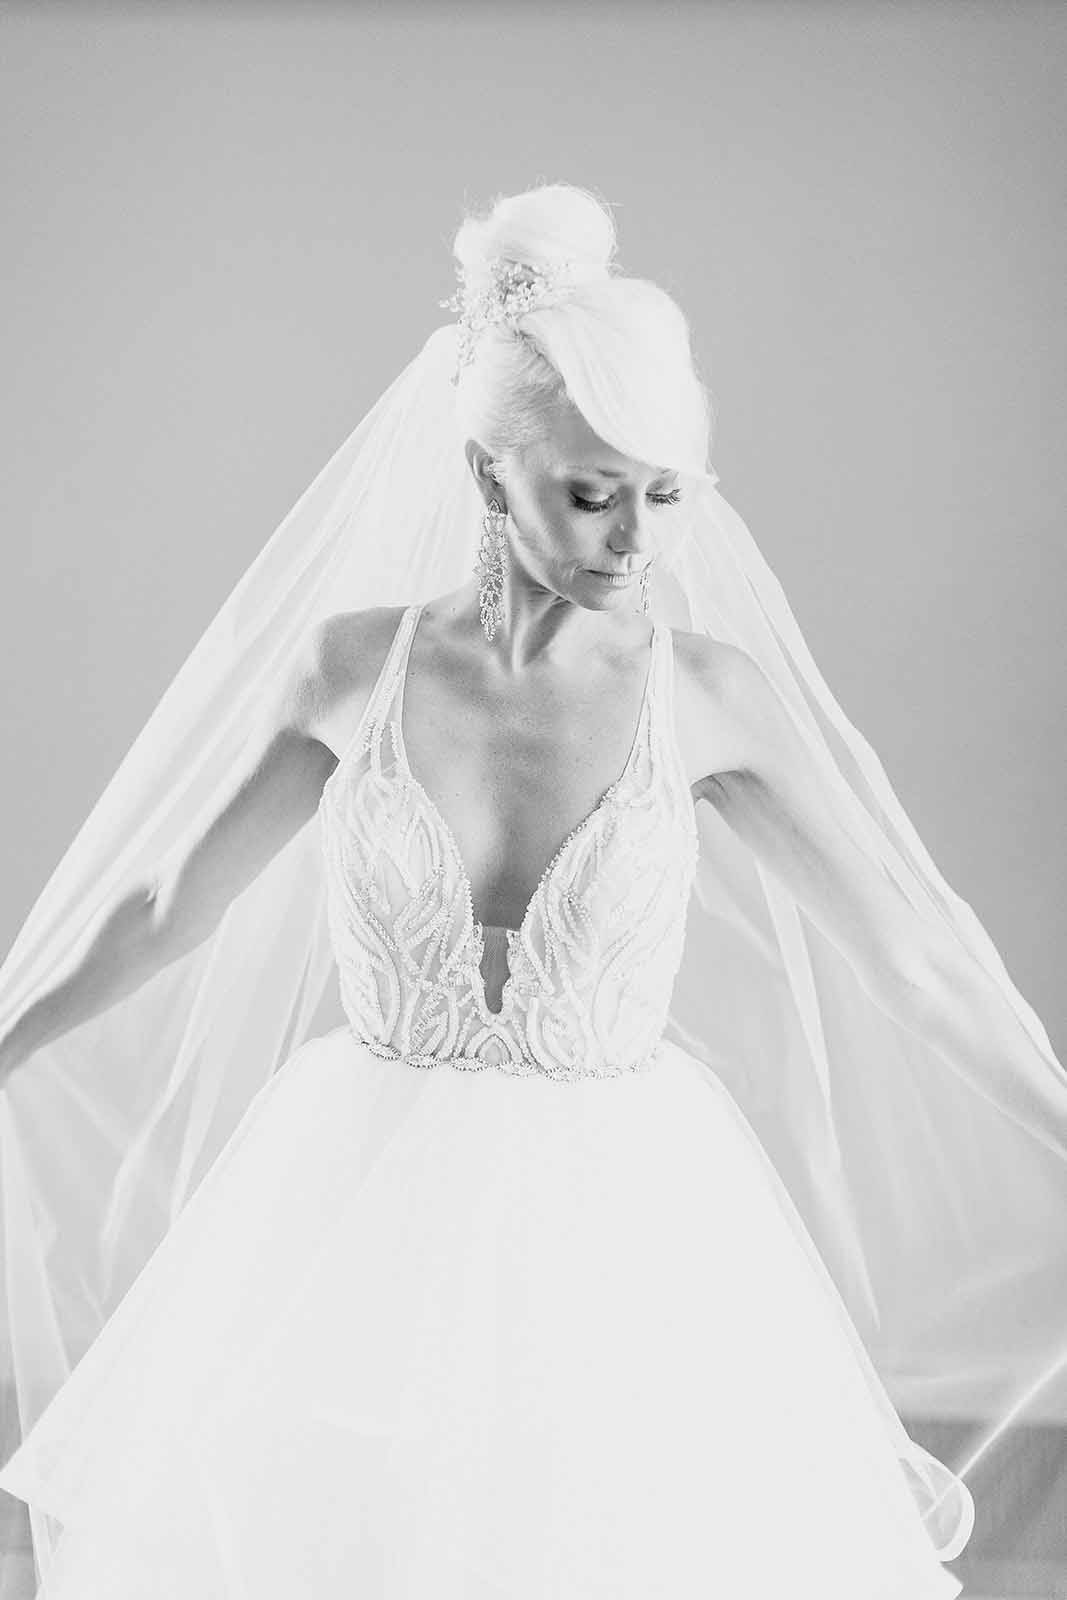 Formal black and white bridal photo in her full skirted fluffy ballgown style dress for a formal white ballroom wedding